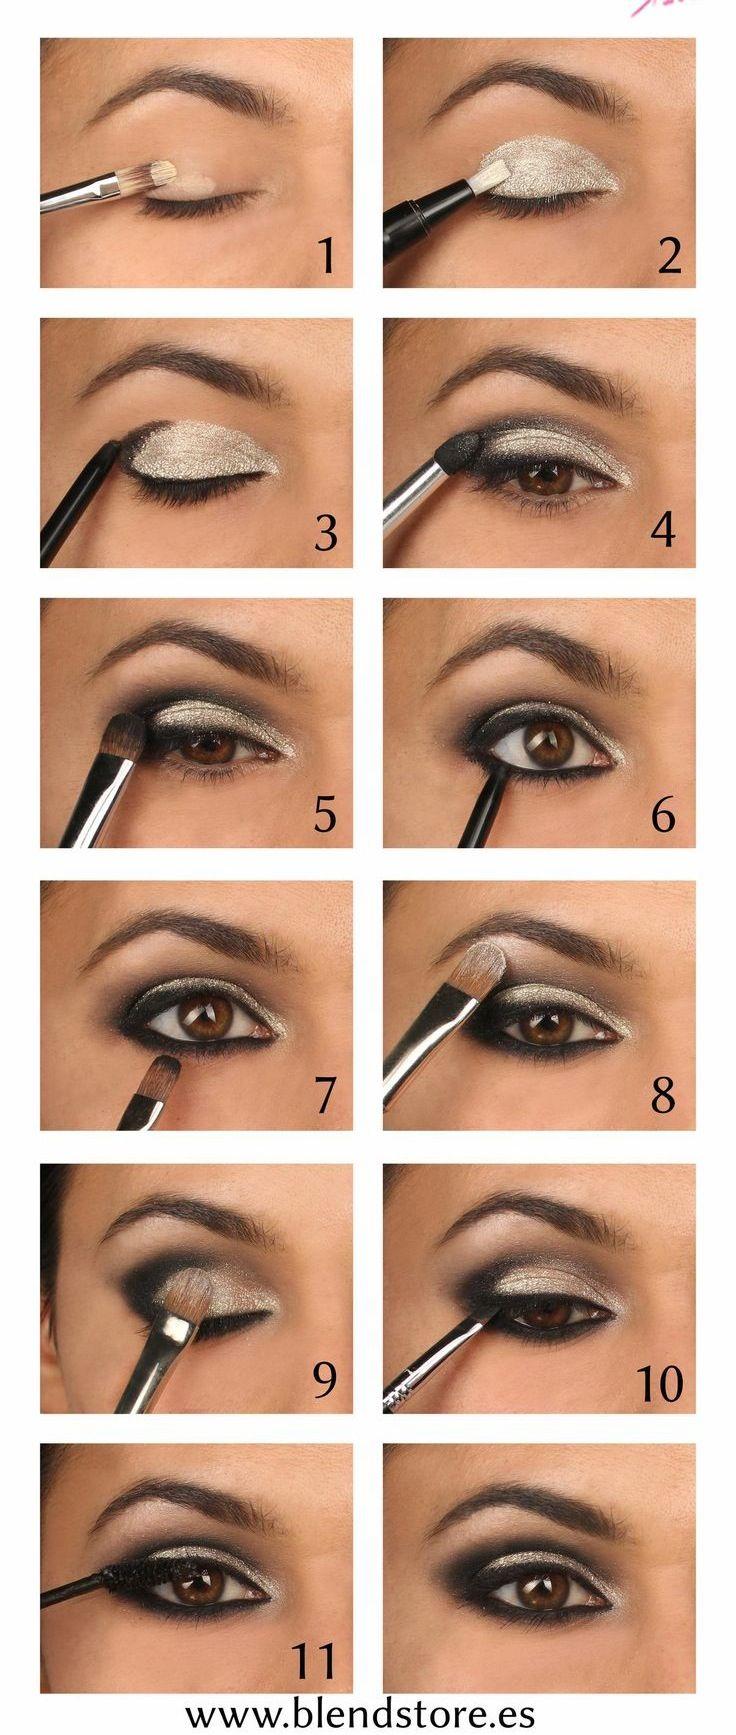 35dc21a8a Contactame para clase de maquillaje oriflamebajabeautista@gmail.com ...